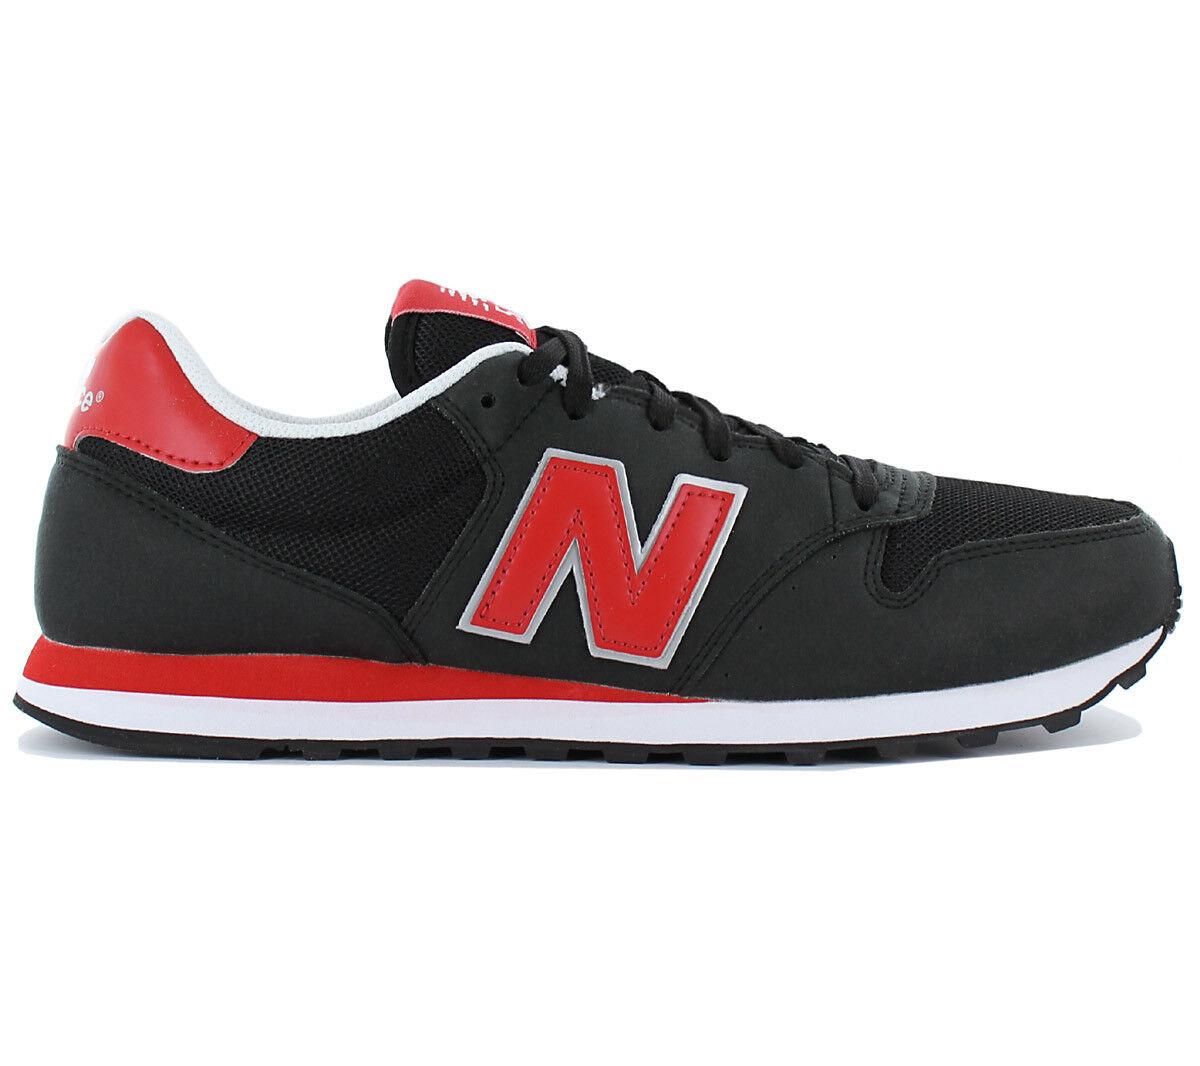 New Balance Classic 500 Zapatillas Estilo Deportivas para Hombre Nb Negro Nb Hombre a403b8